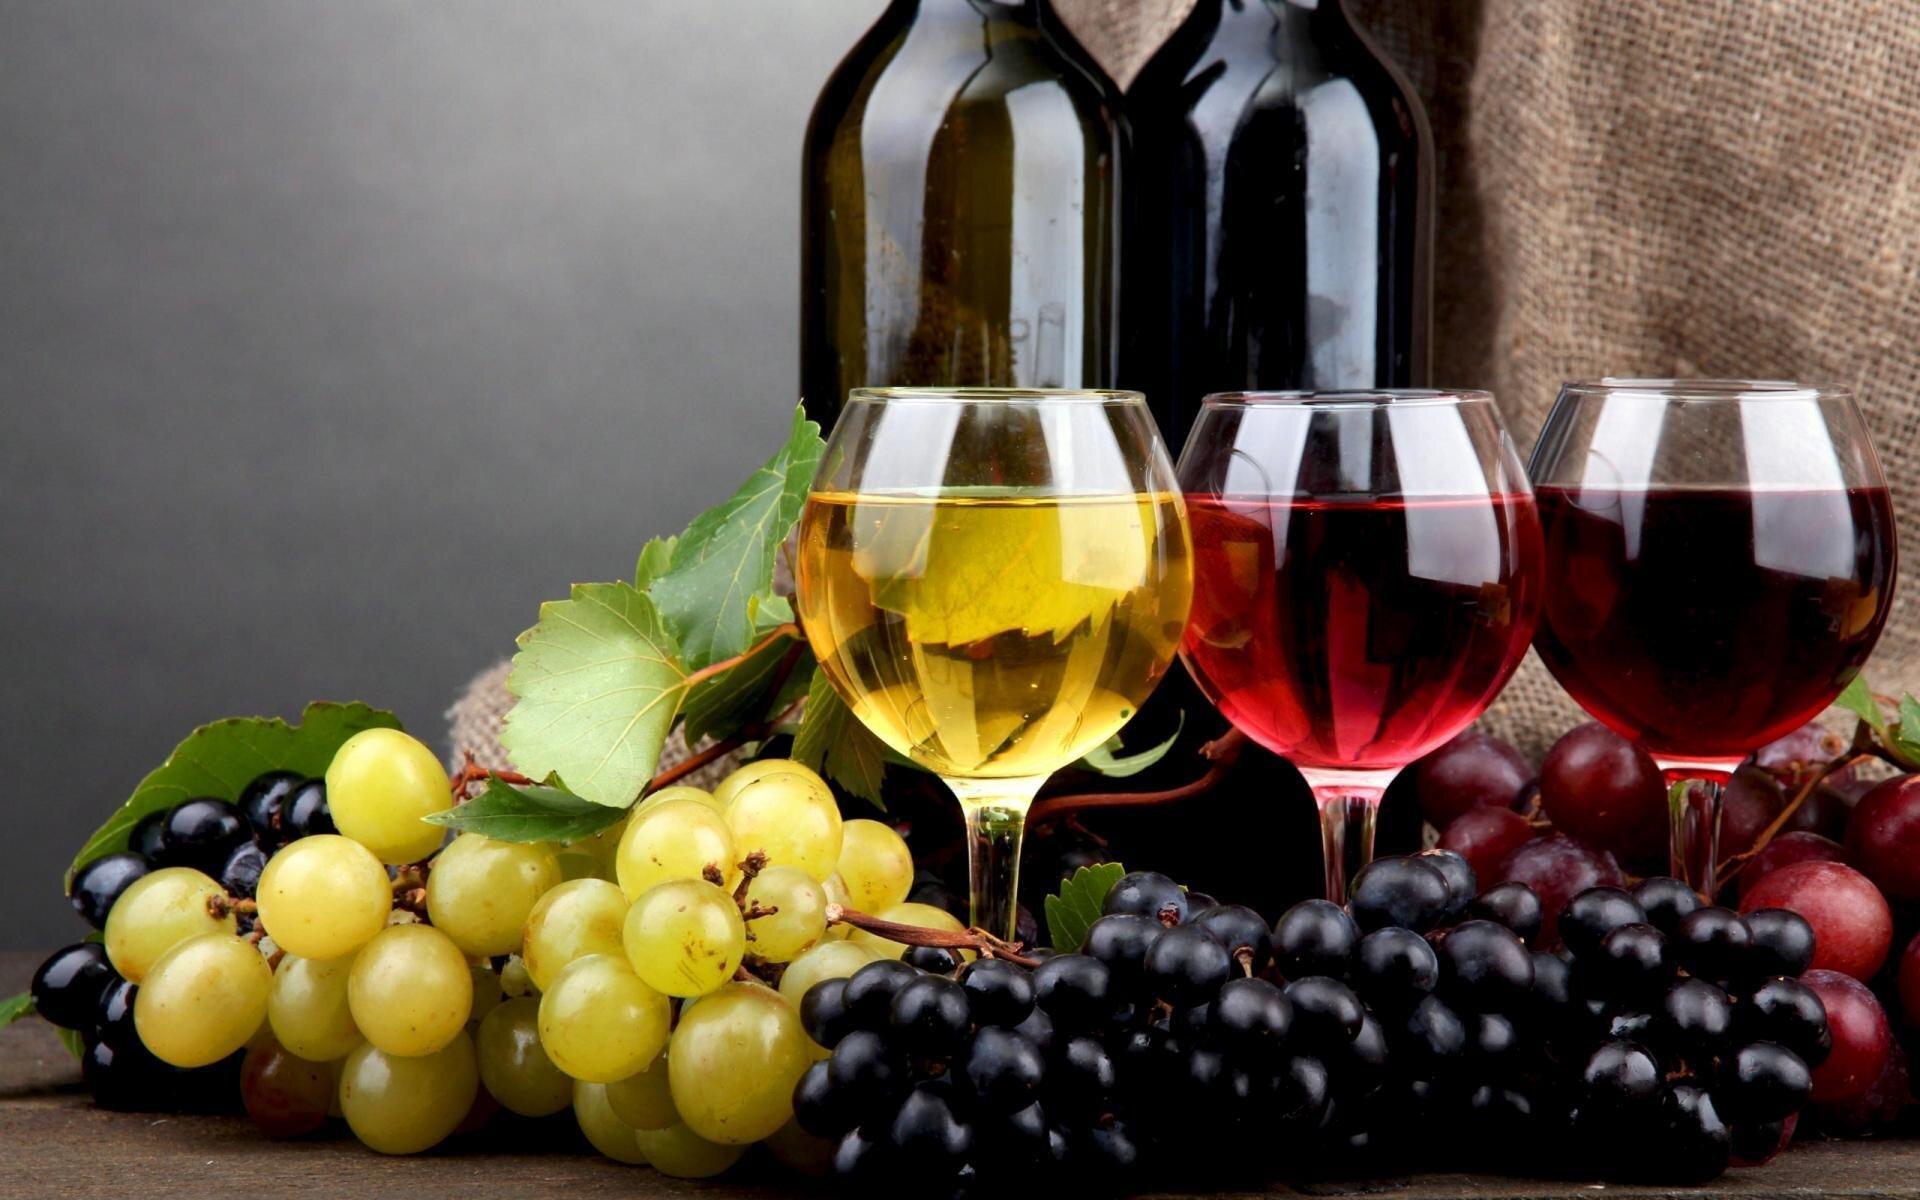 Безалкогольное вино - фото pic_a1e1abe0f43ae45766a0eee7f7cccdd1_1920x9000_1.jpg